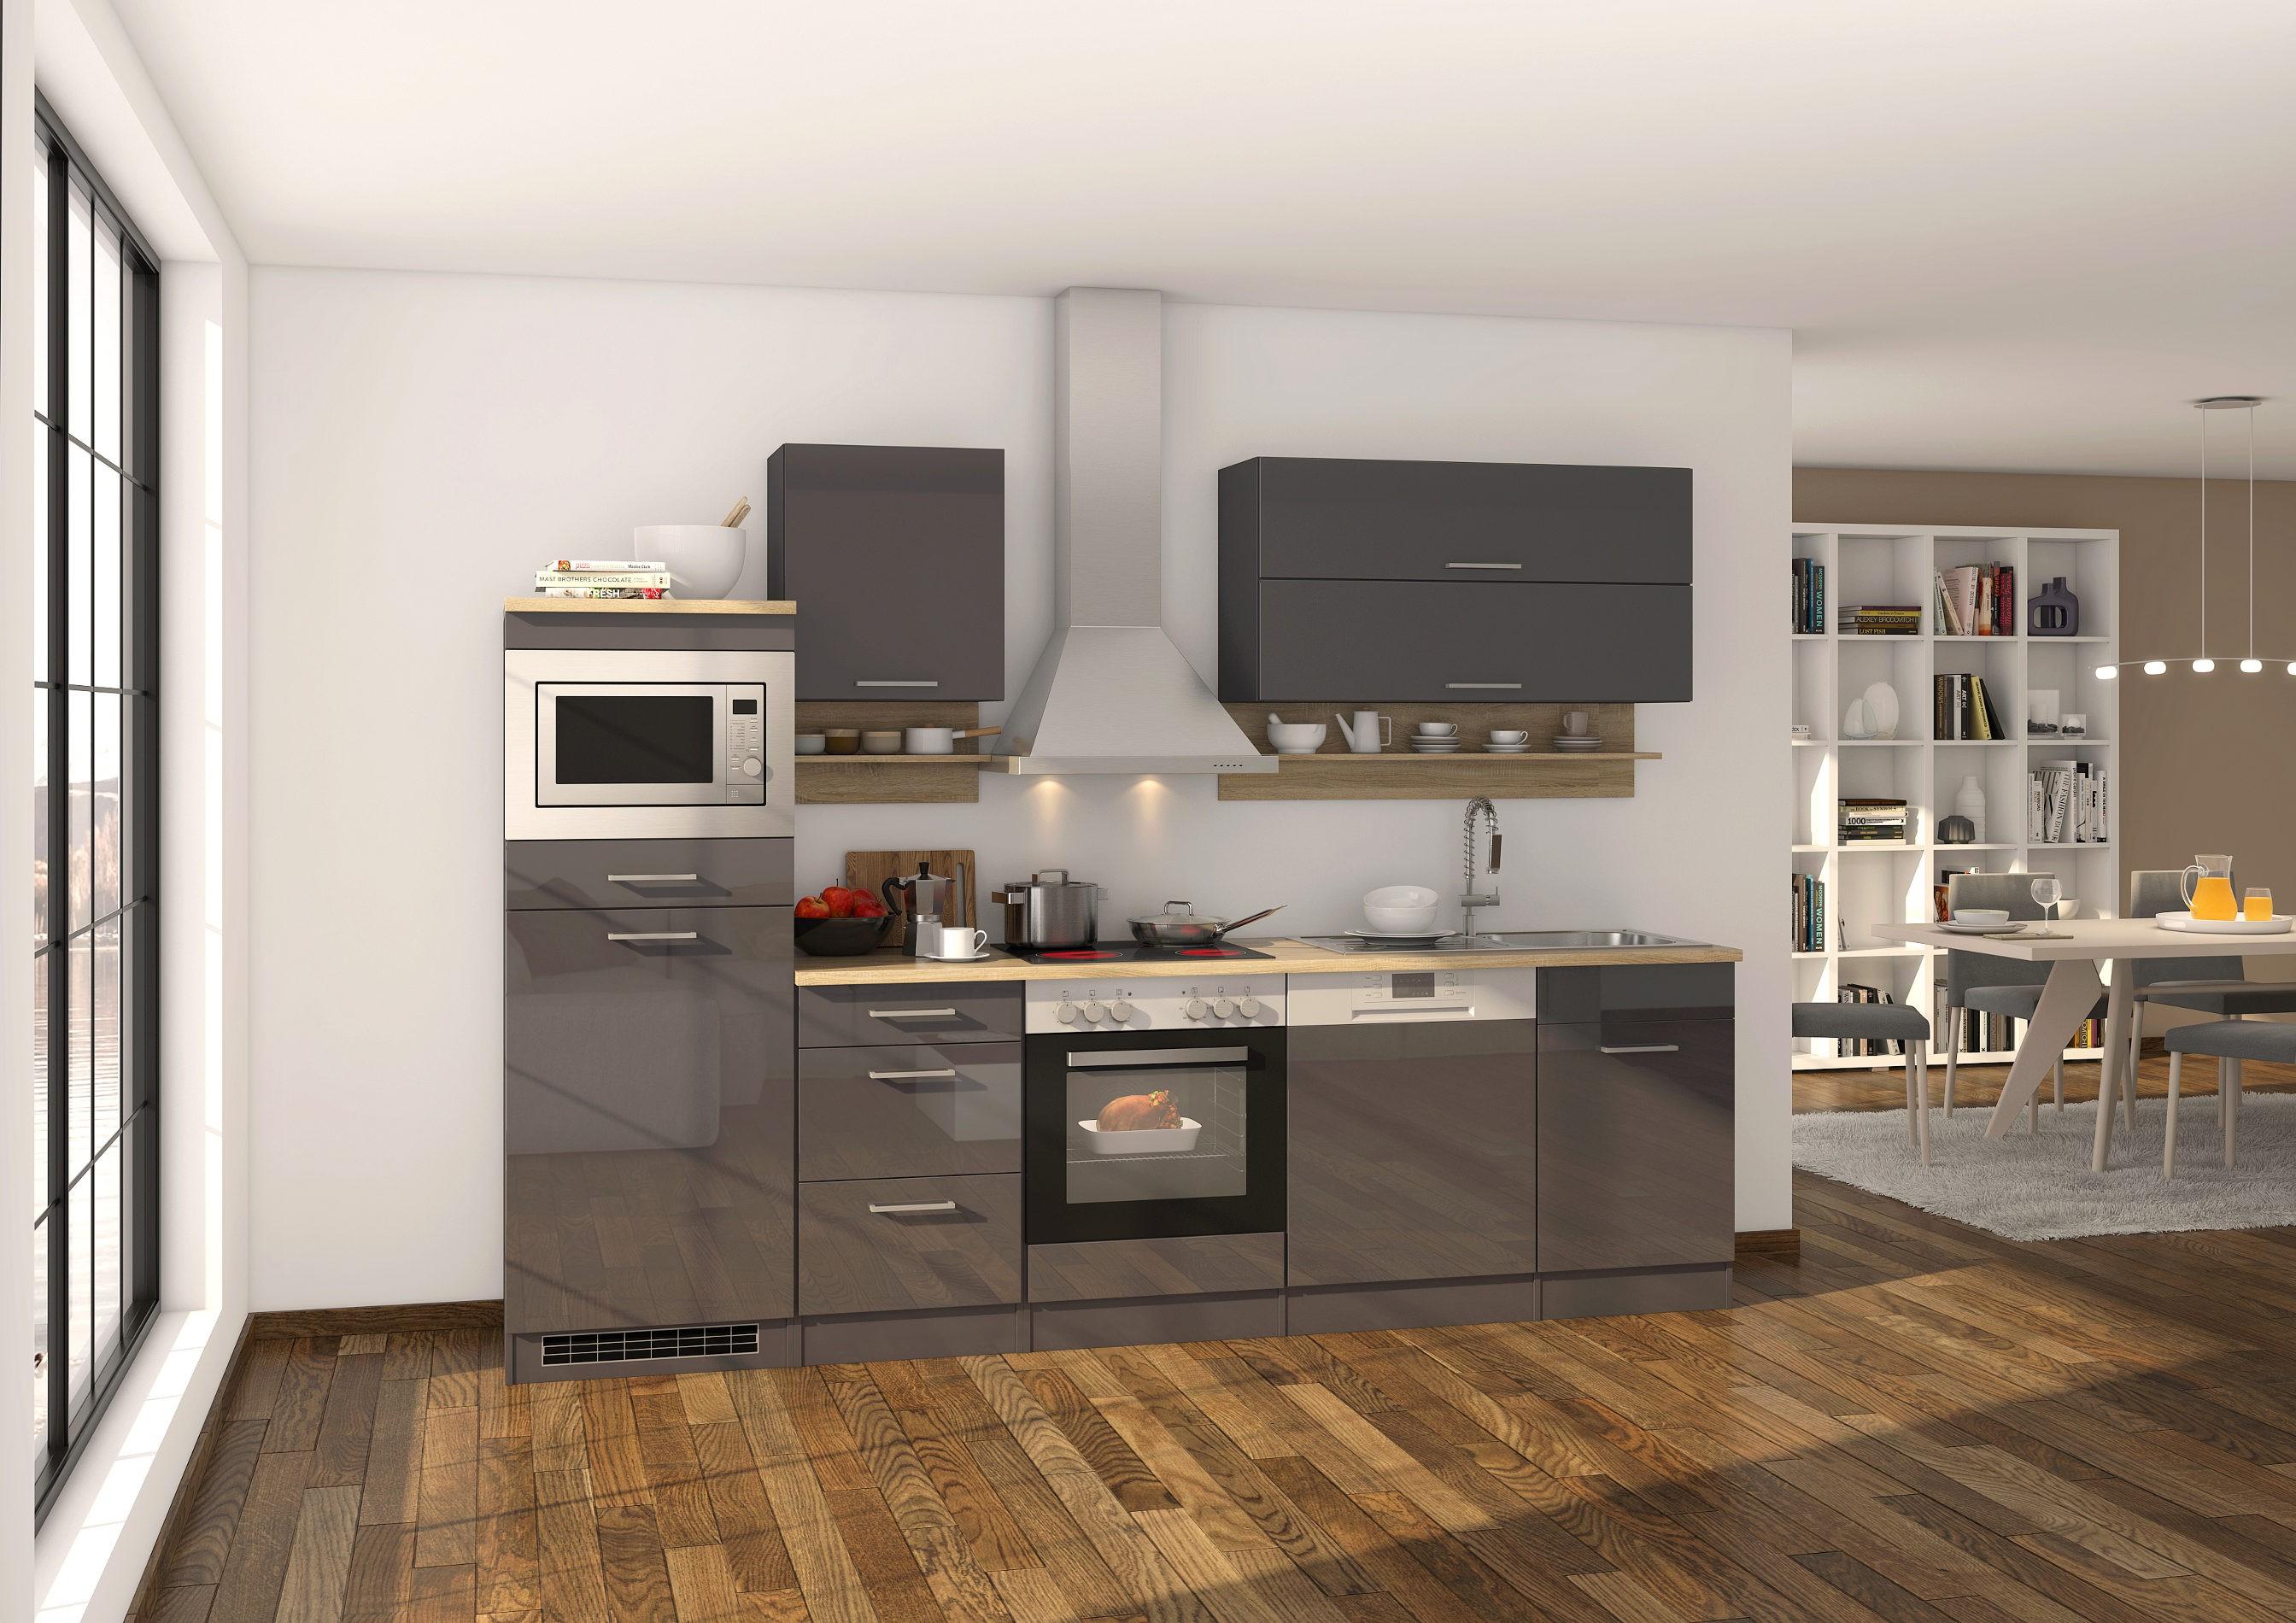 k chen h ngeschrank m nchen 2 klappen 110 cm breit. Black Bedroom Furniture Sets. Home Design Ideas